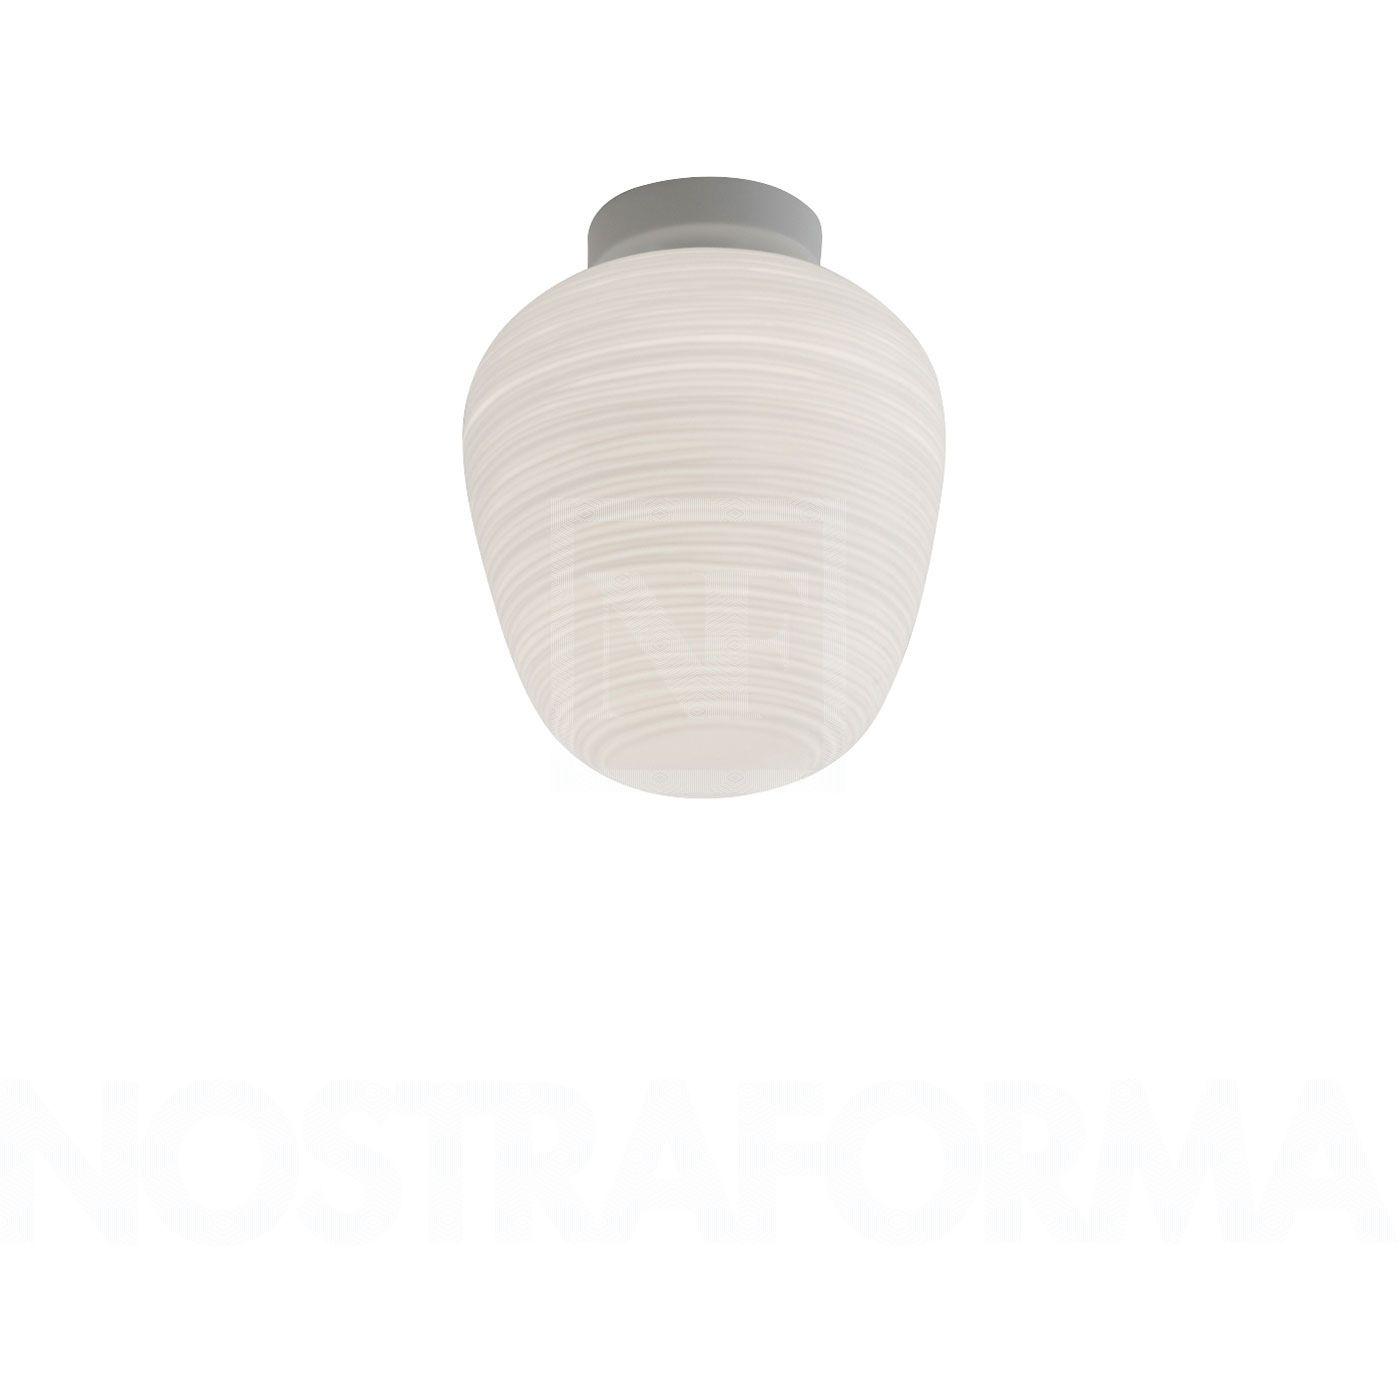 Rituals Ceiling Lamp